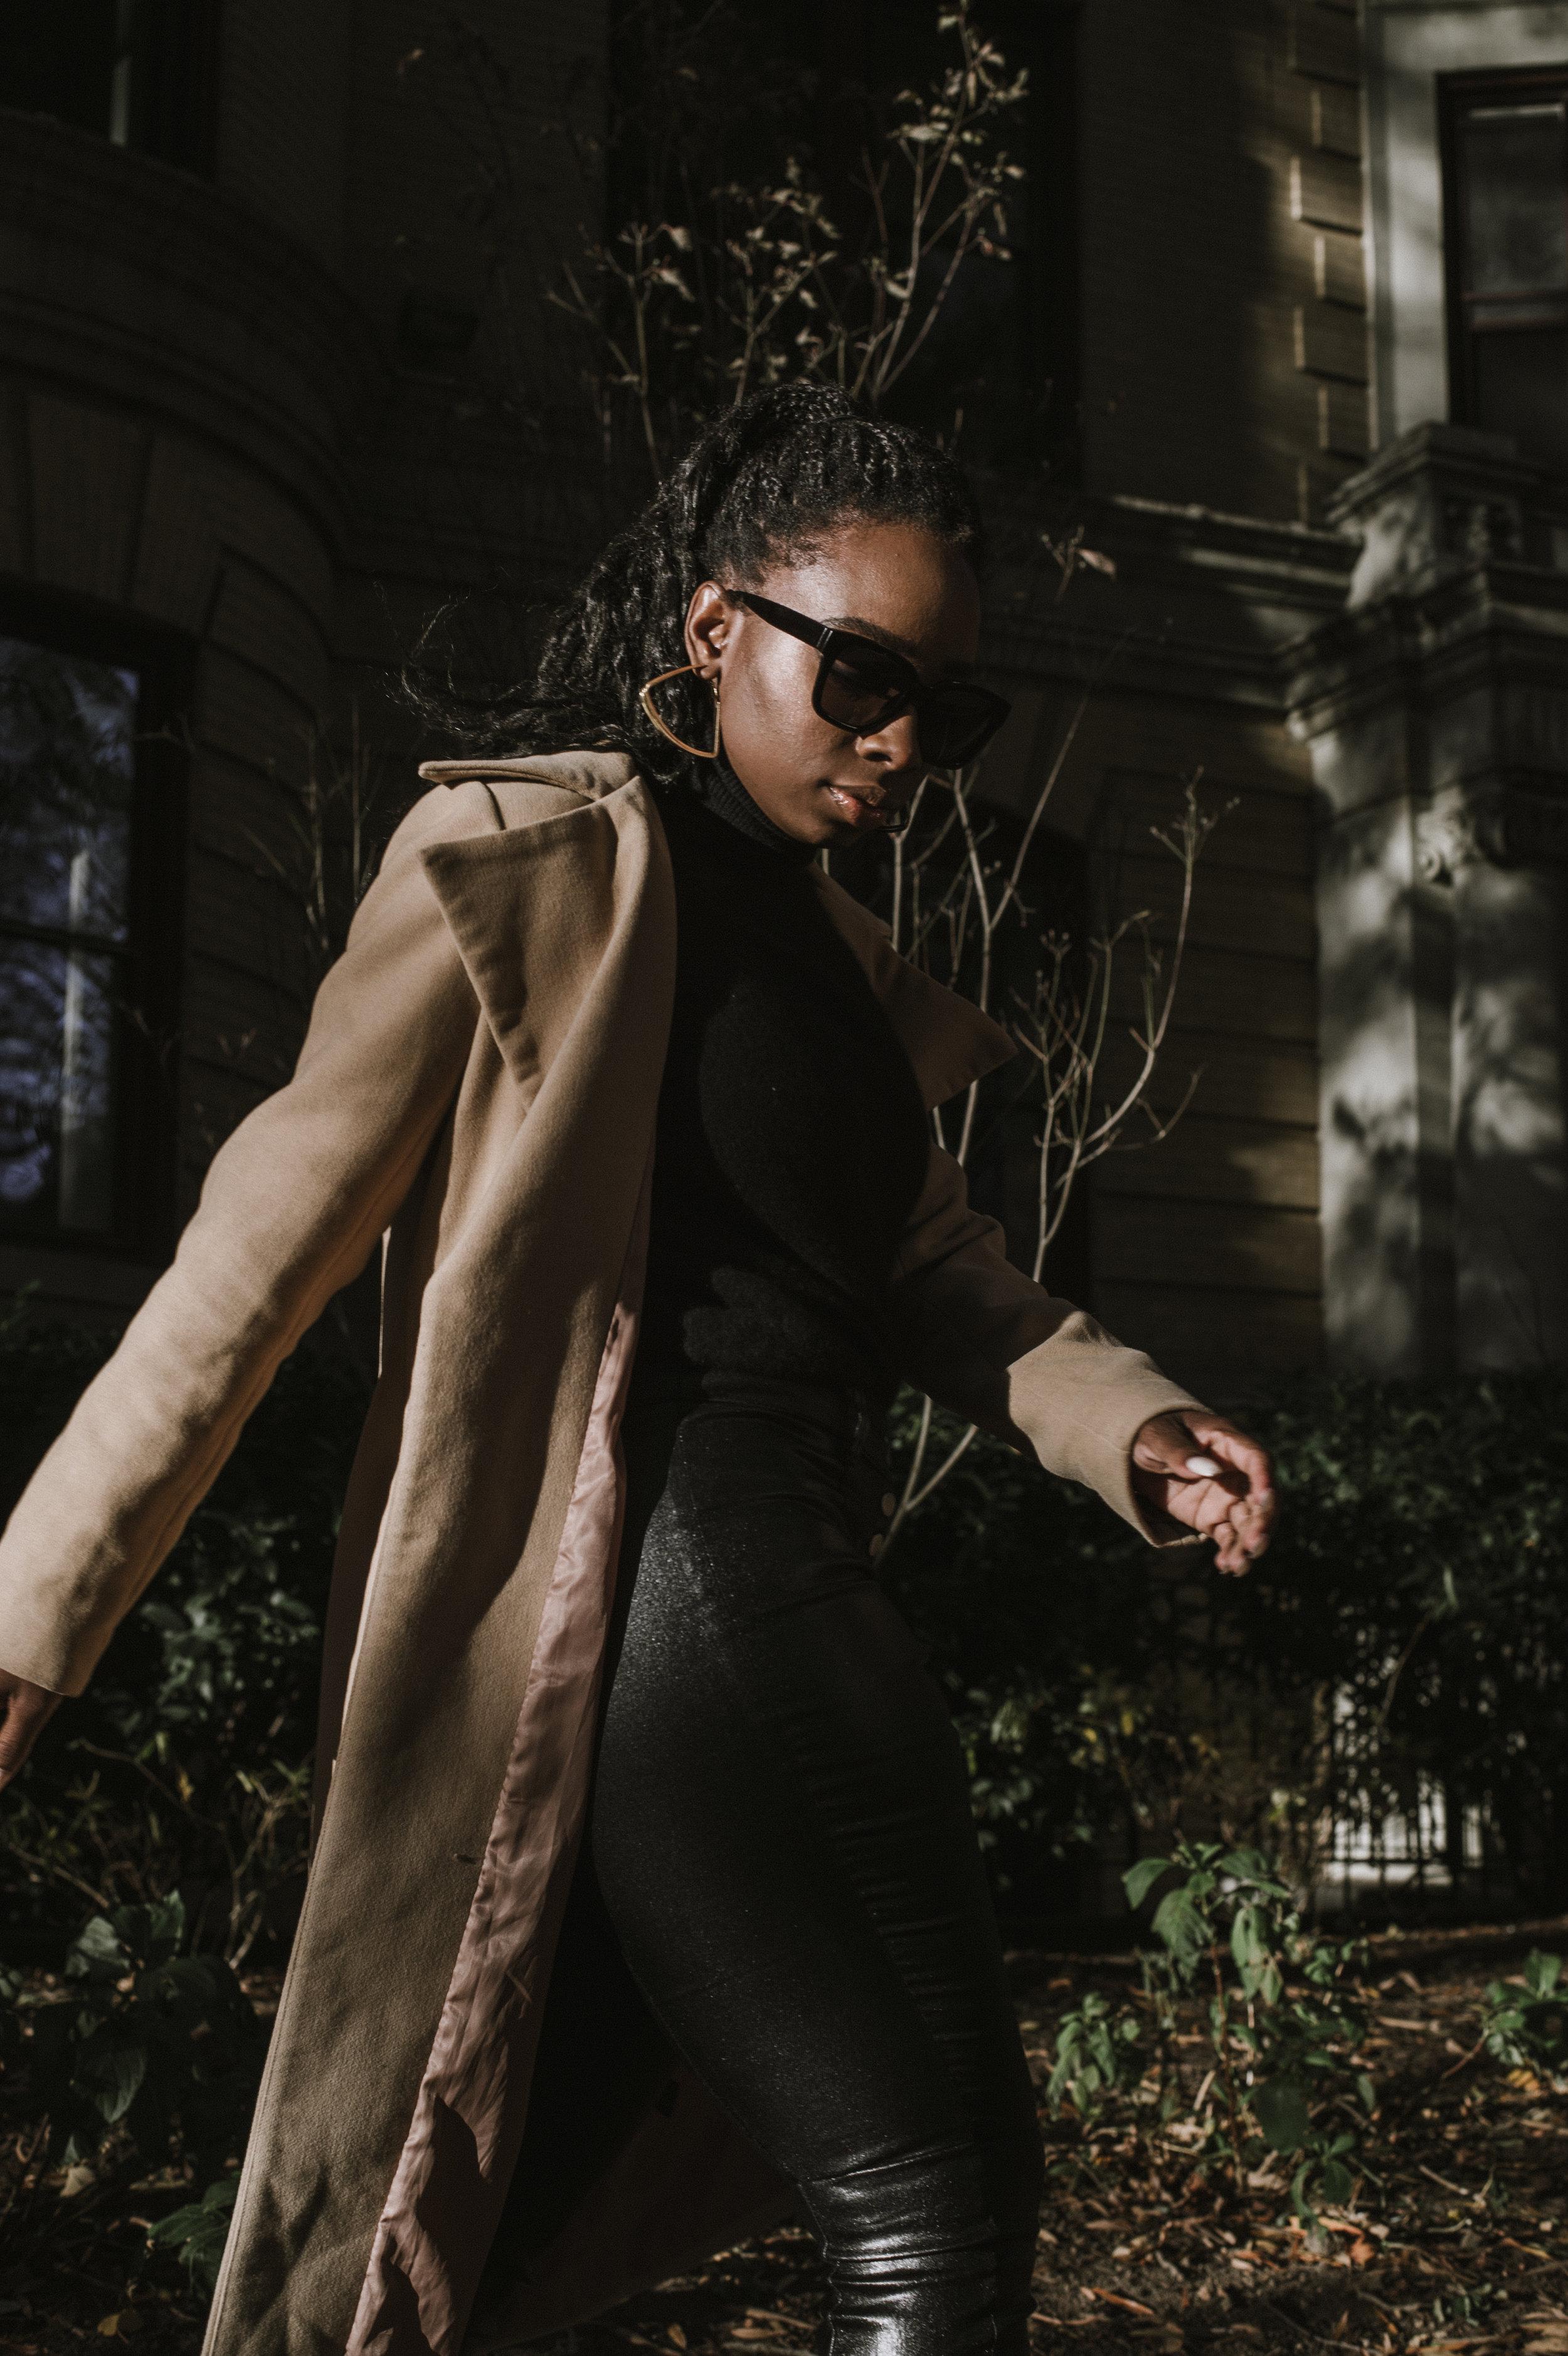 The-Glossier-Tasha-James-Fashion-Style-Blogger-DC-Winter-Coat-All-Black-36.jpg